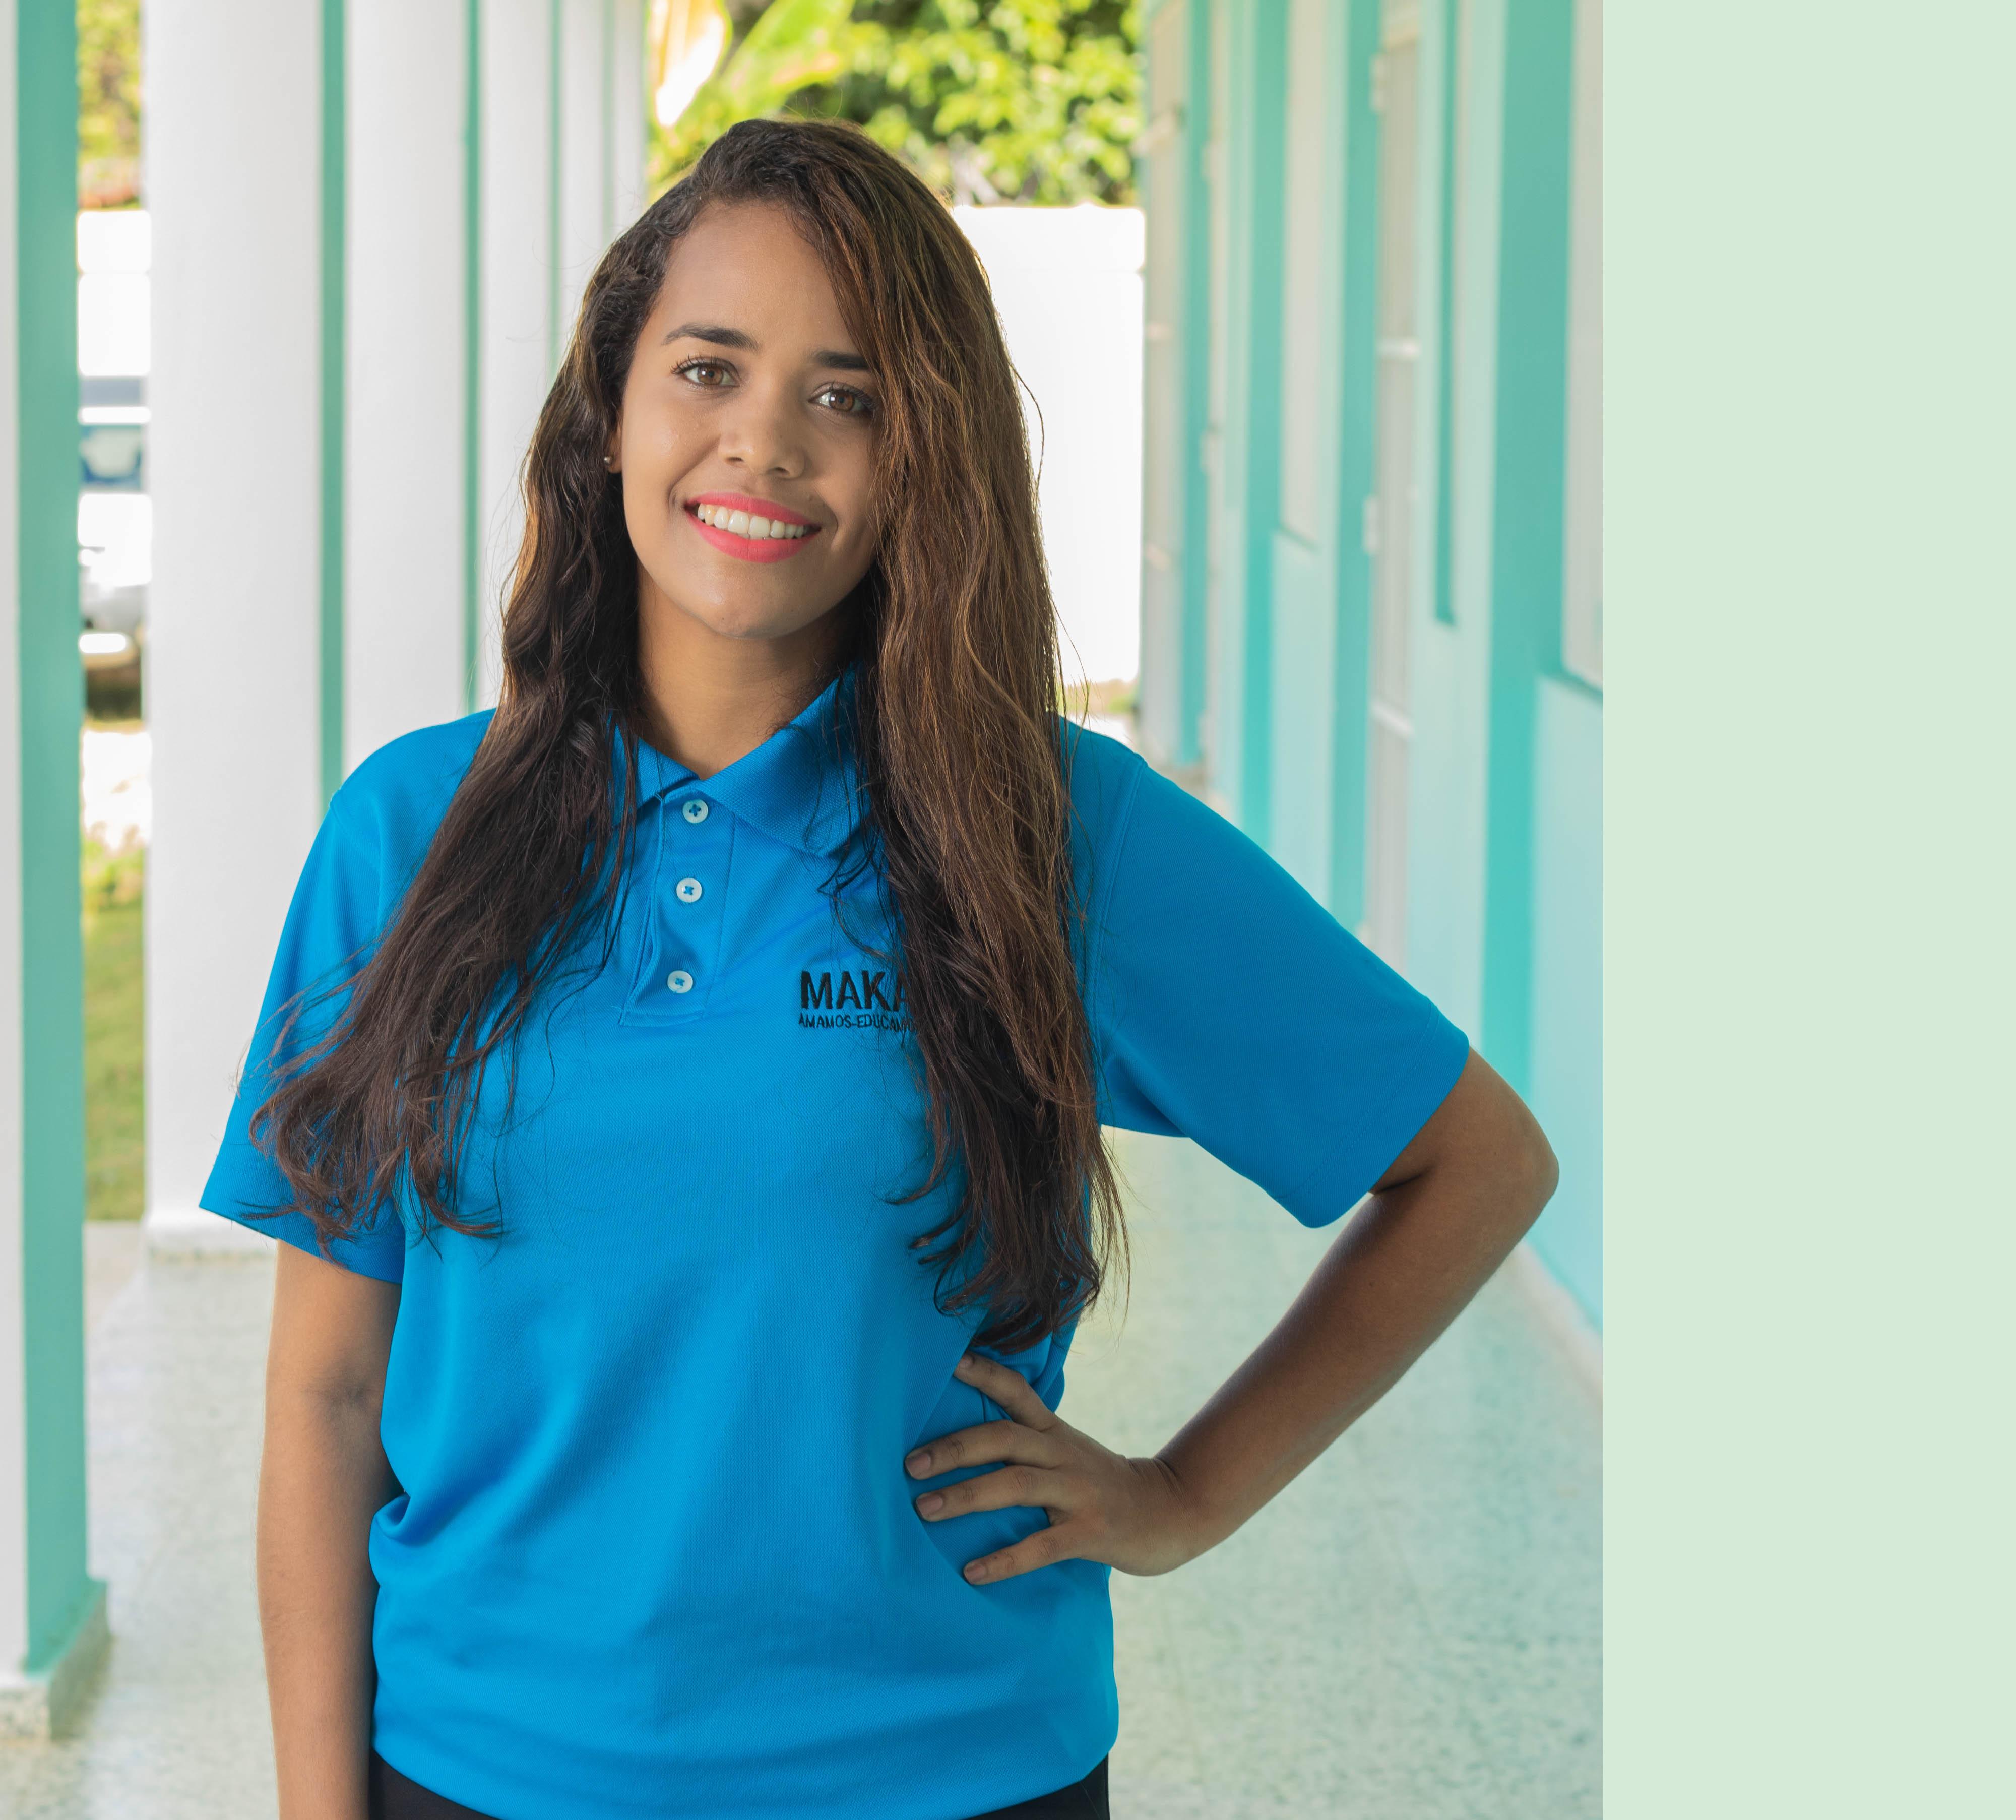 Yurisa Nunez Mejia